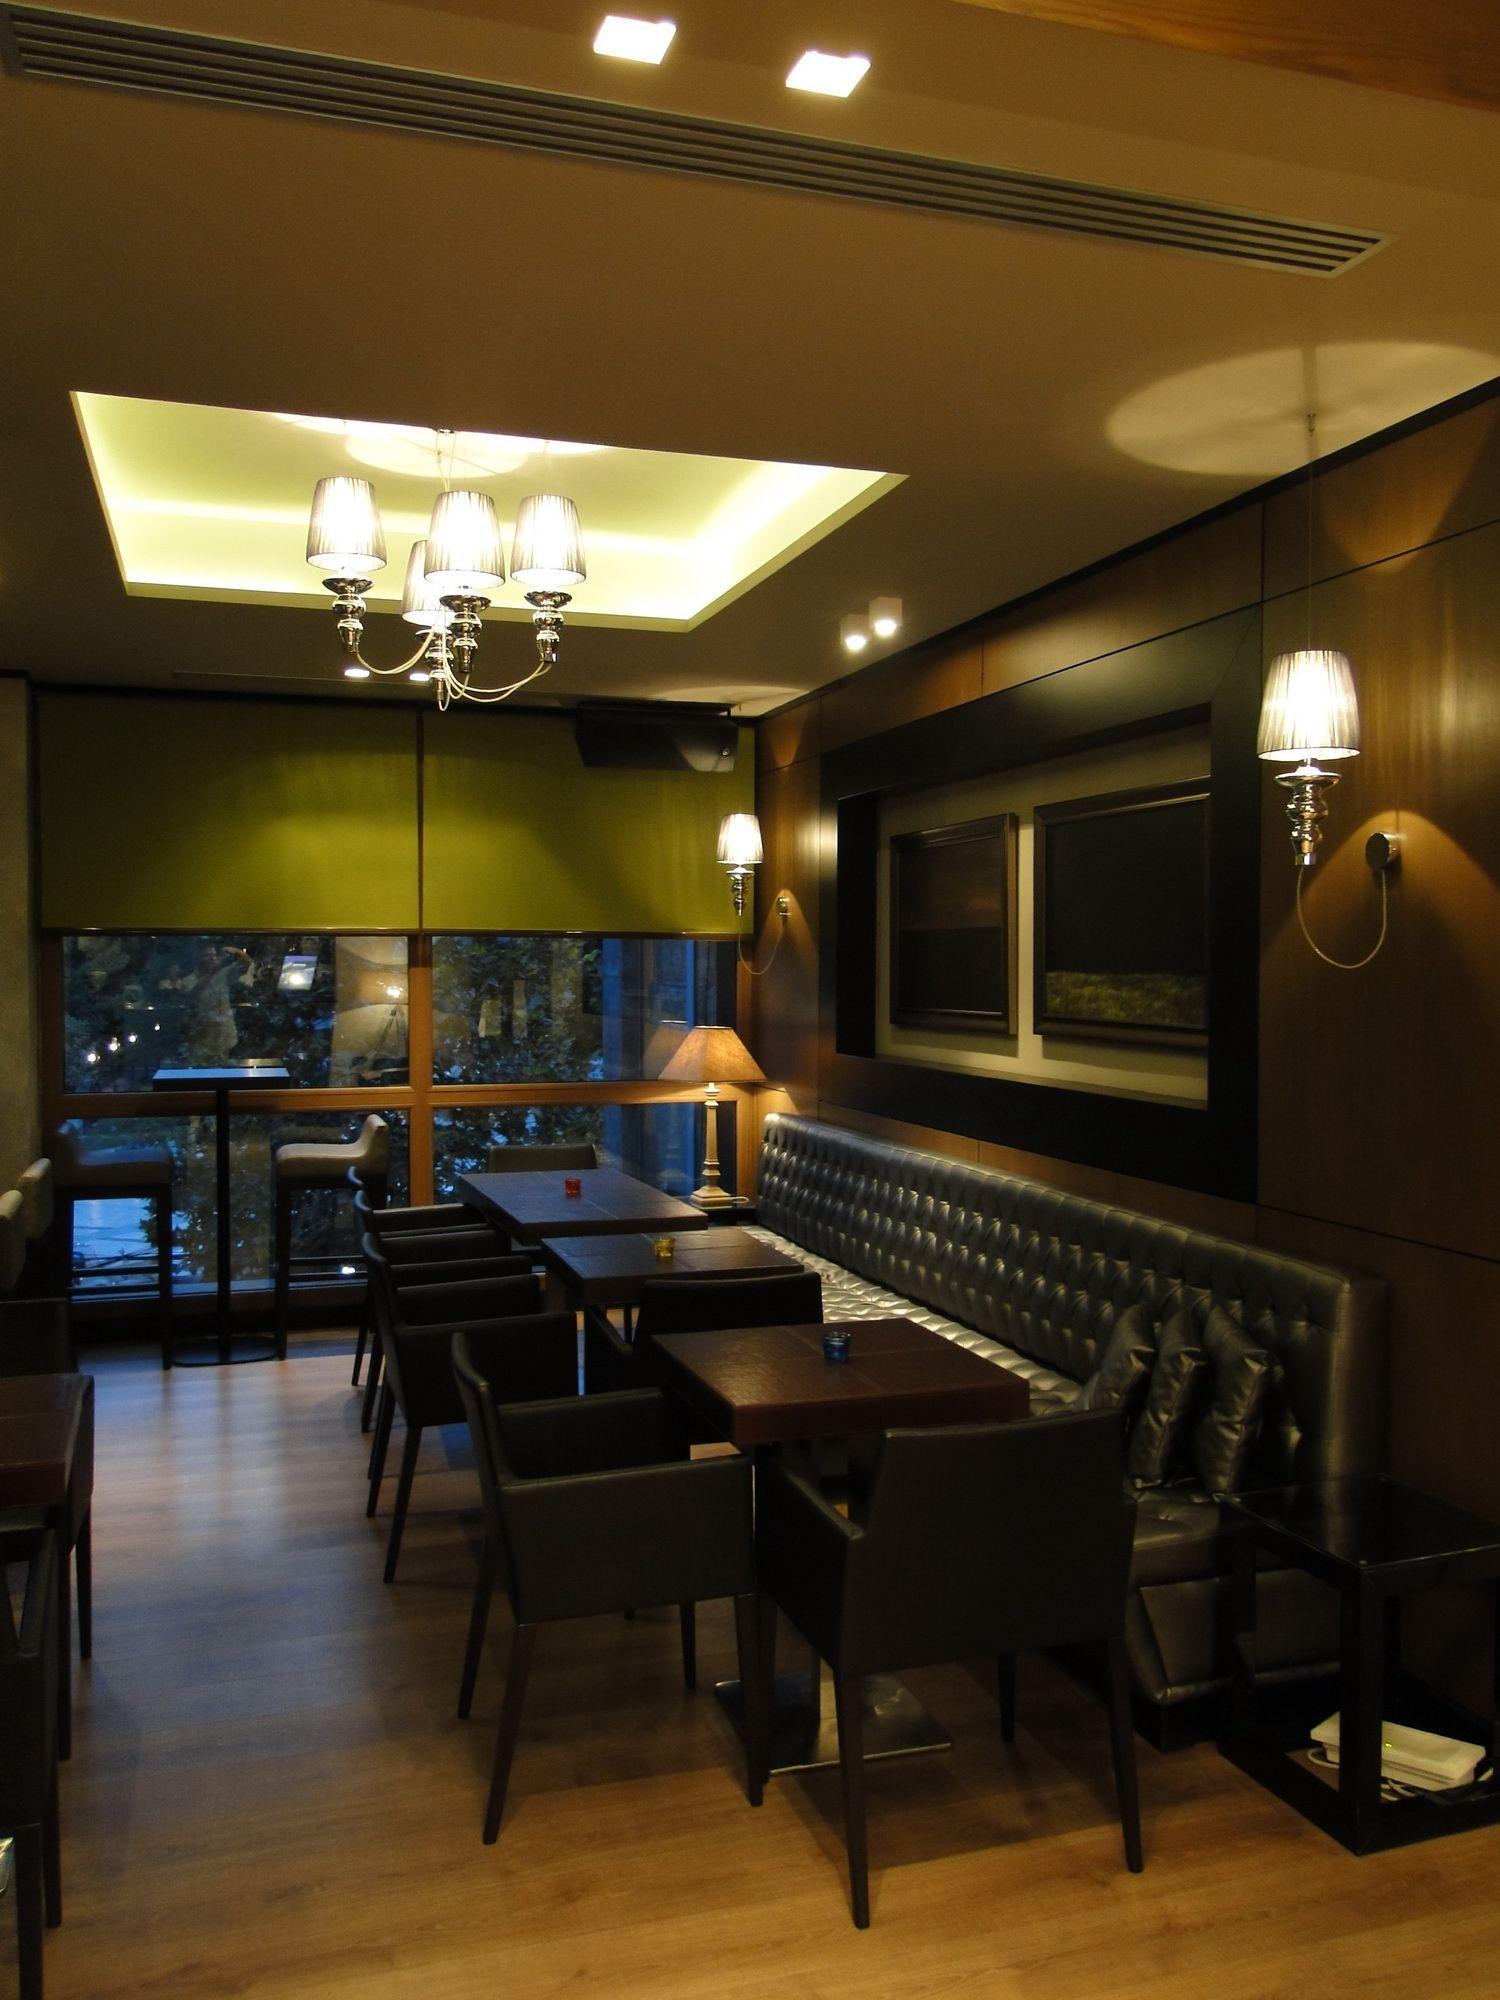 Gadora Collection By Evi Style At Delano Lounge Restaurant Tirana Albania Thanks Reflectlights Gadorachandelier Evistyle Made Restaurant Home Home Decor